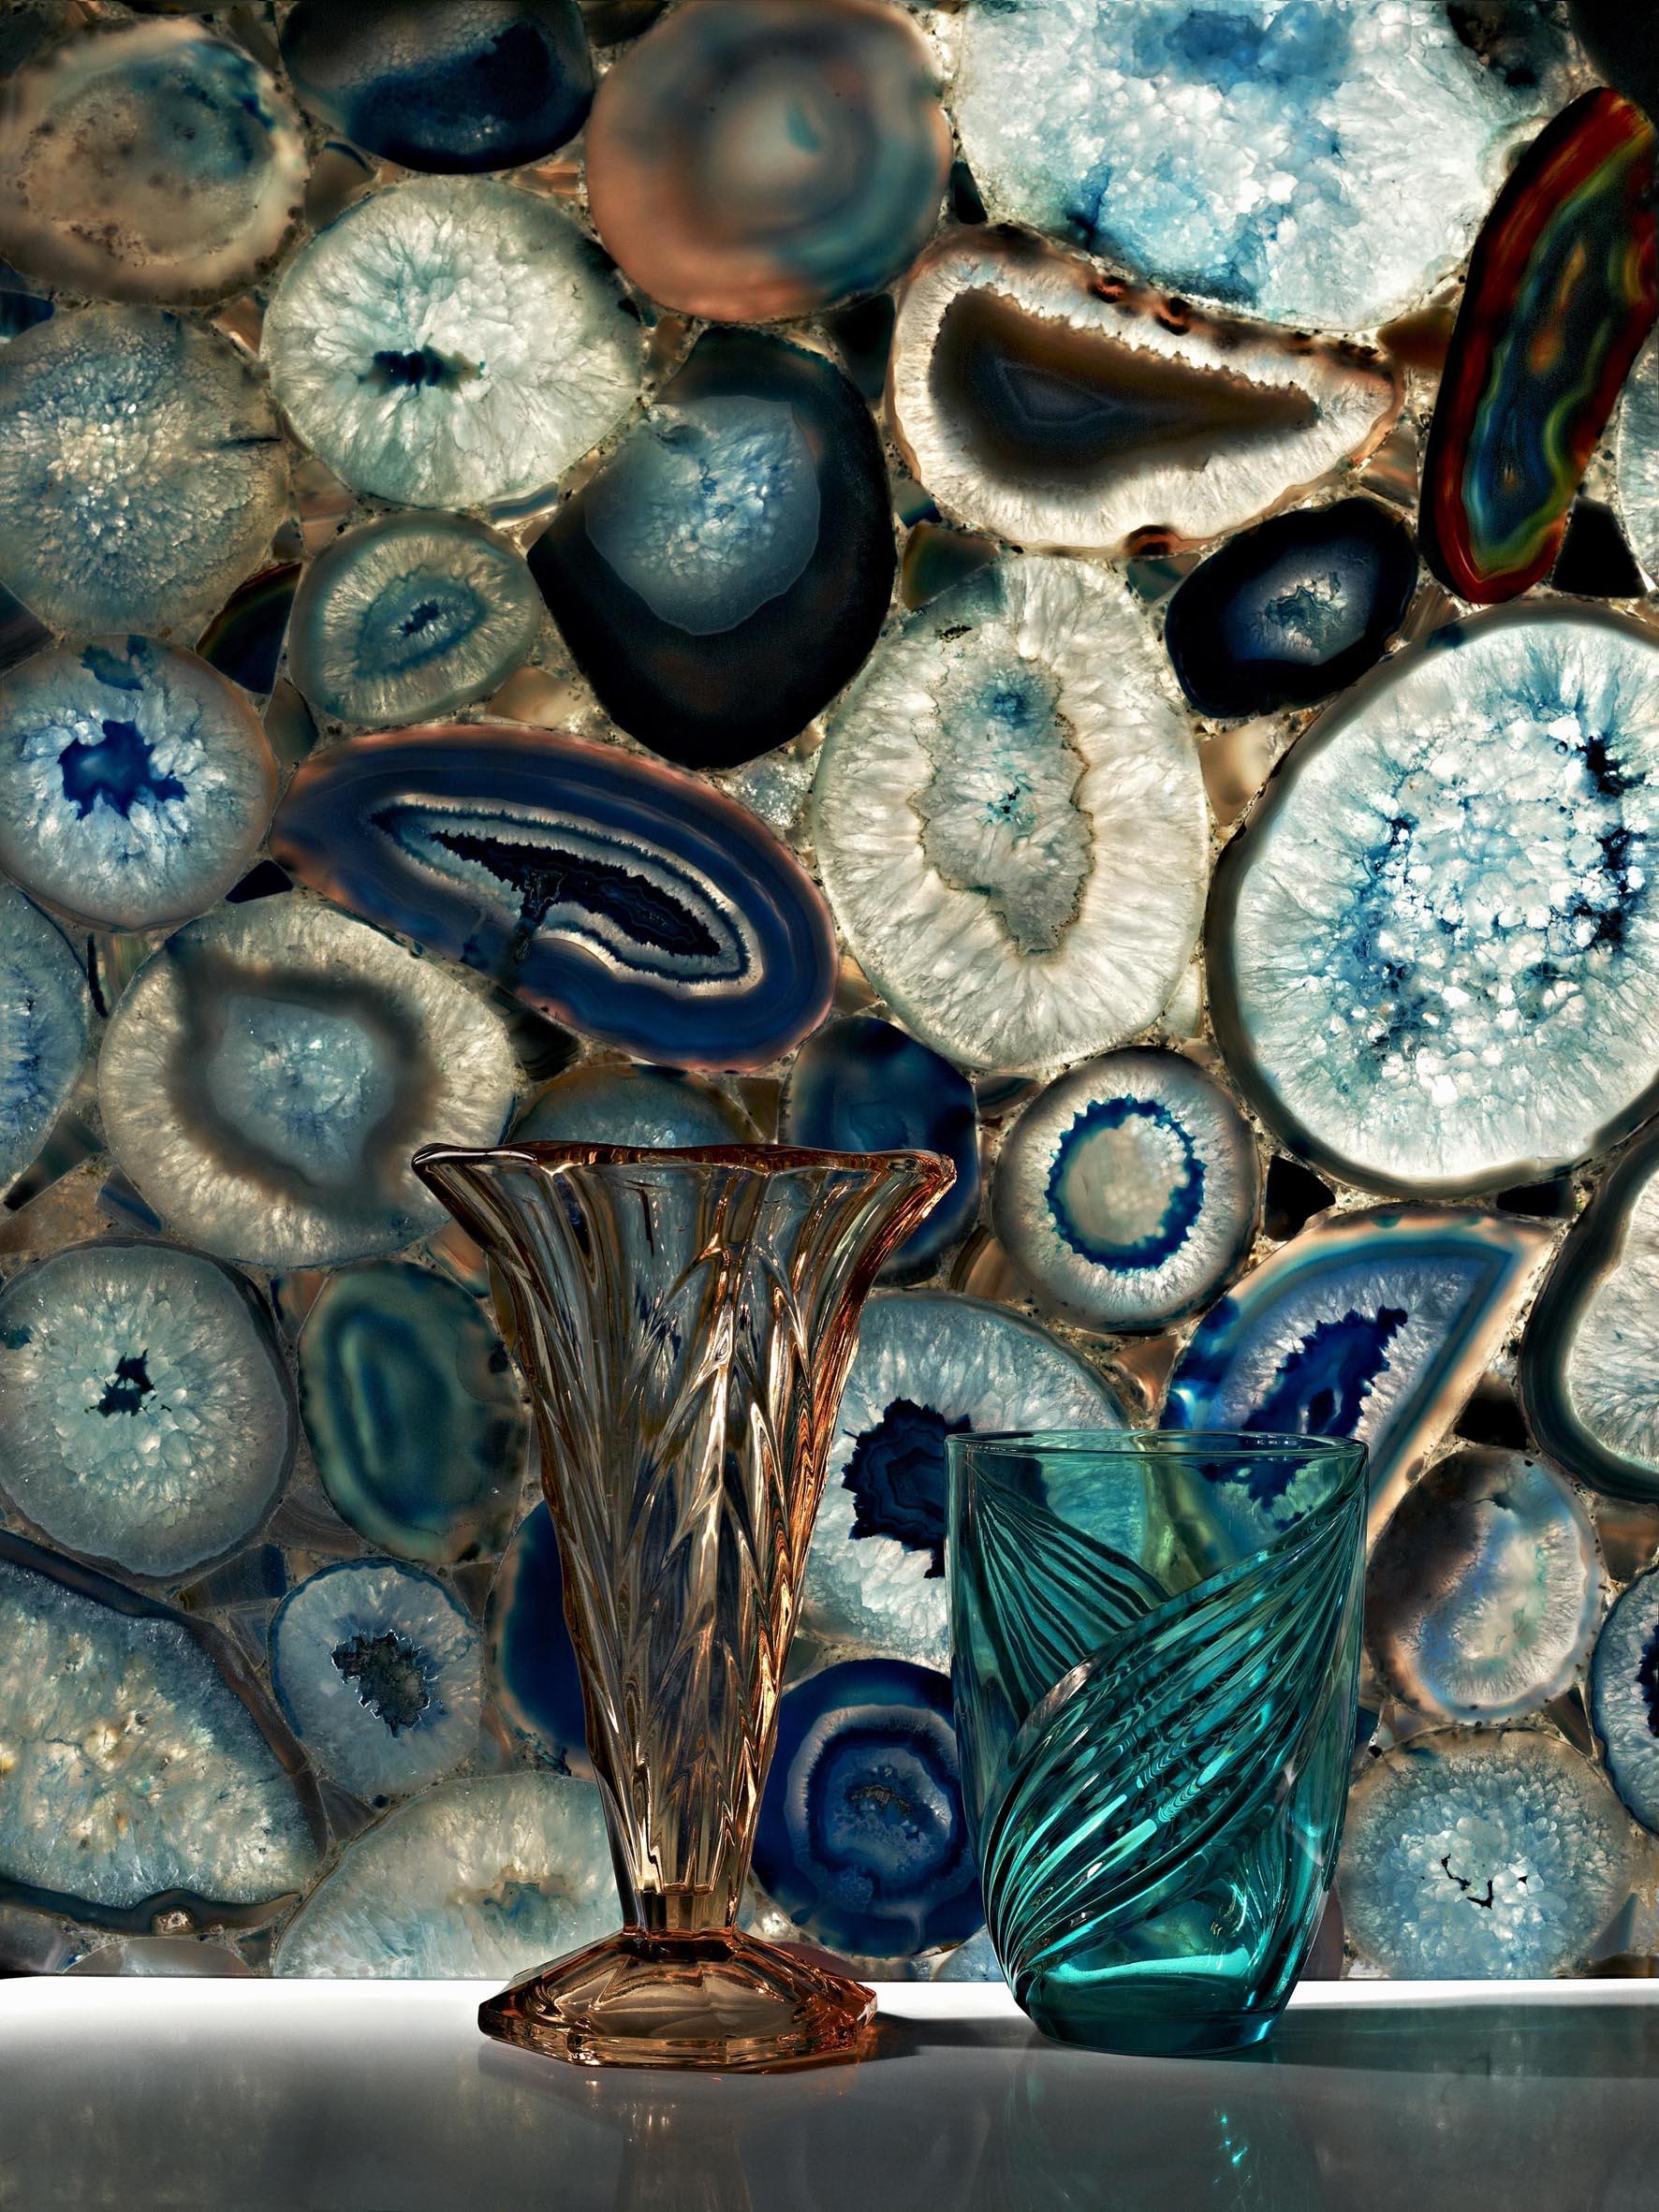 Caesarstone Concetto Collection